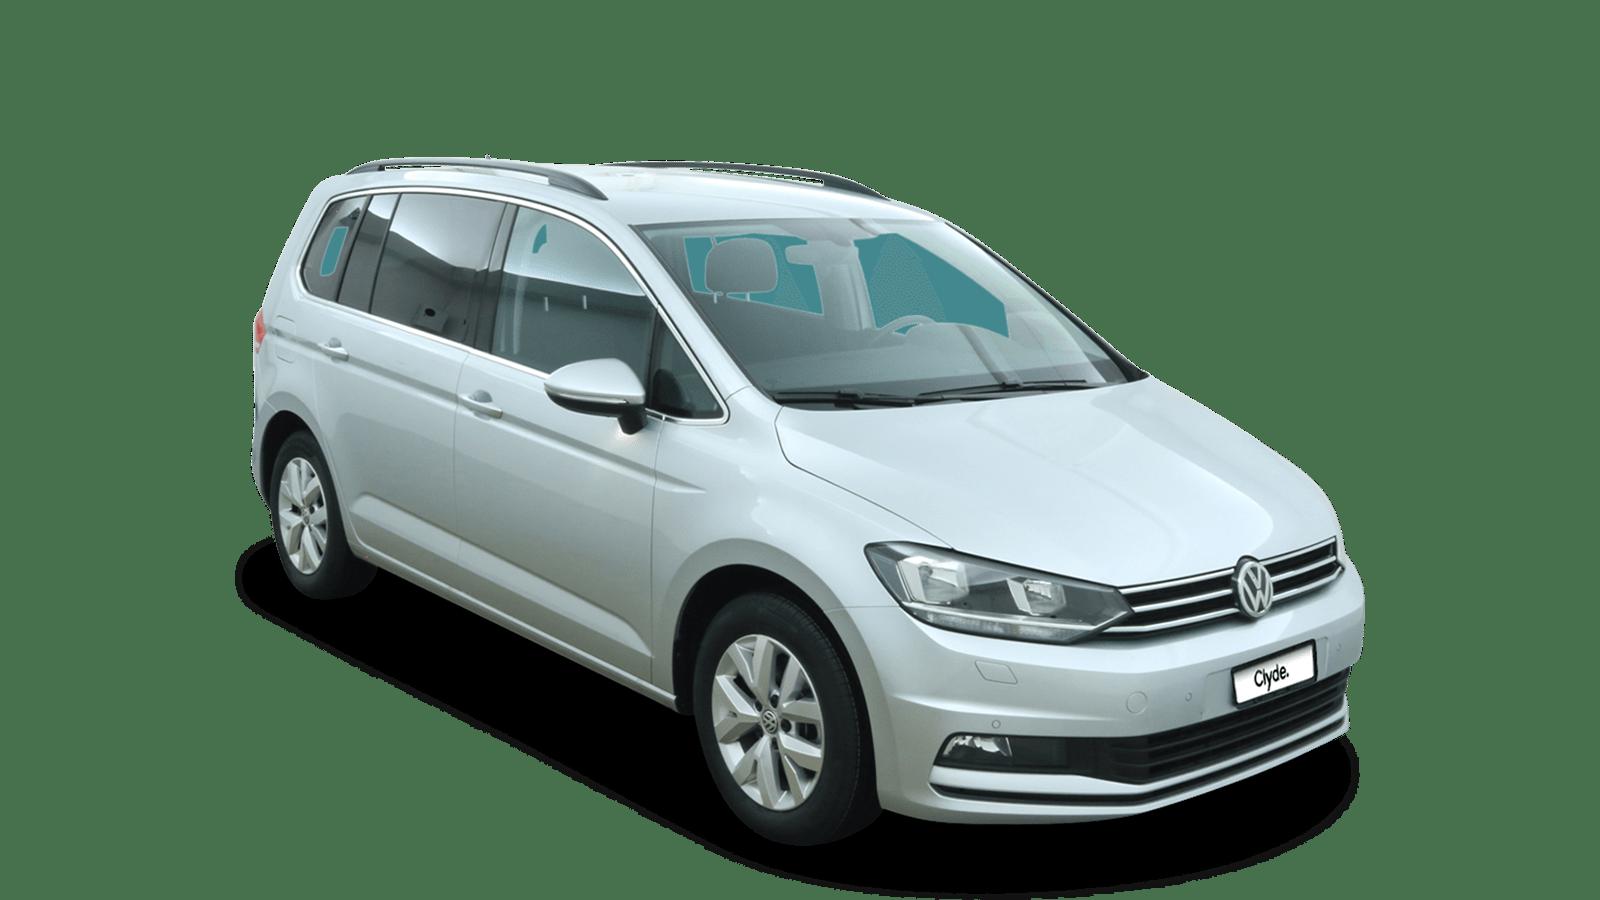 VW Touran Silver front - Clyde car subscription